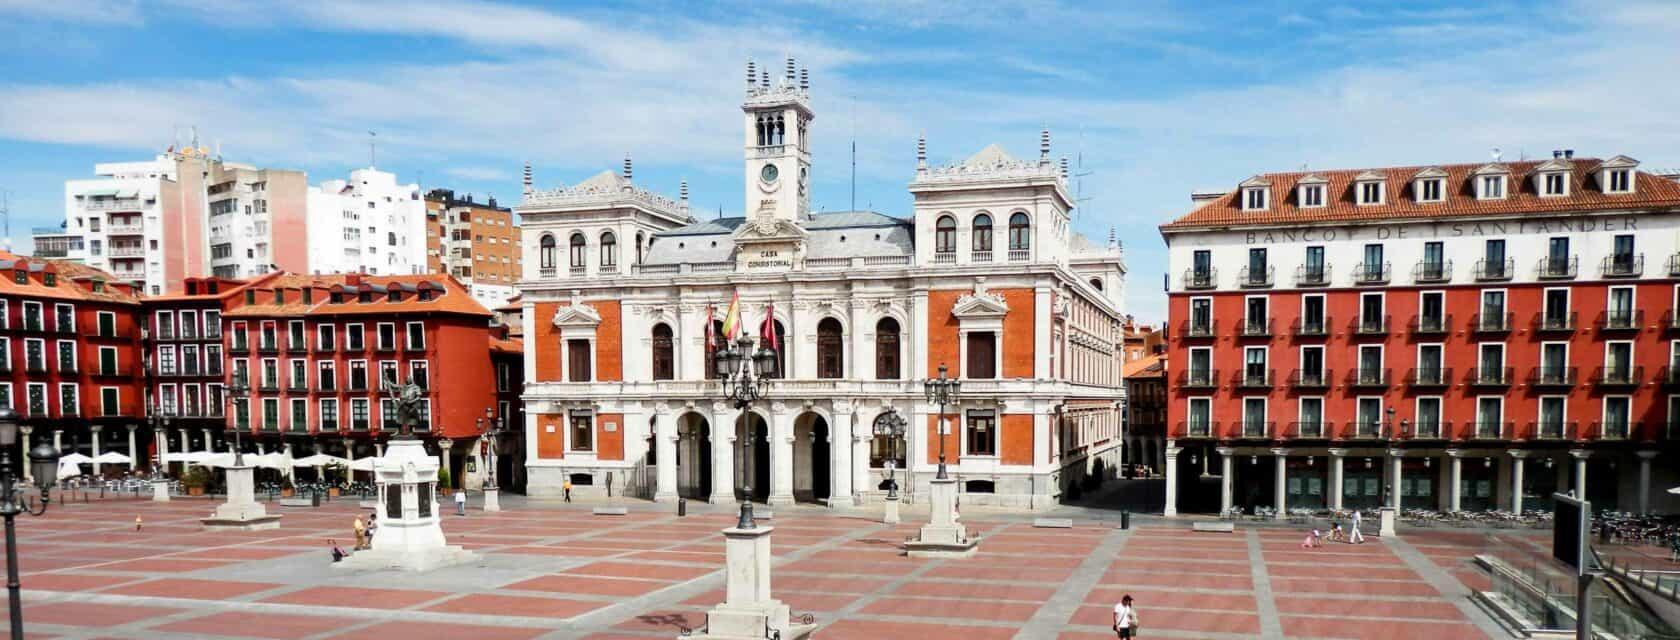 Plaza Mayor in Valladolid.